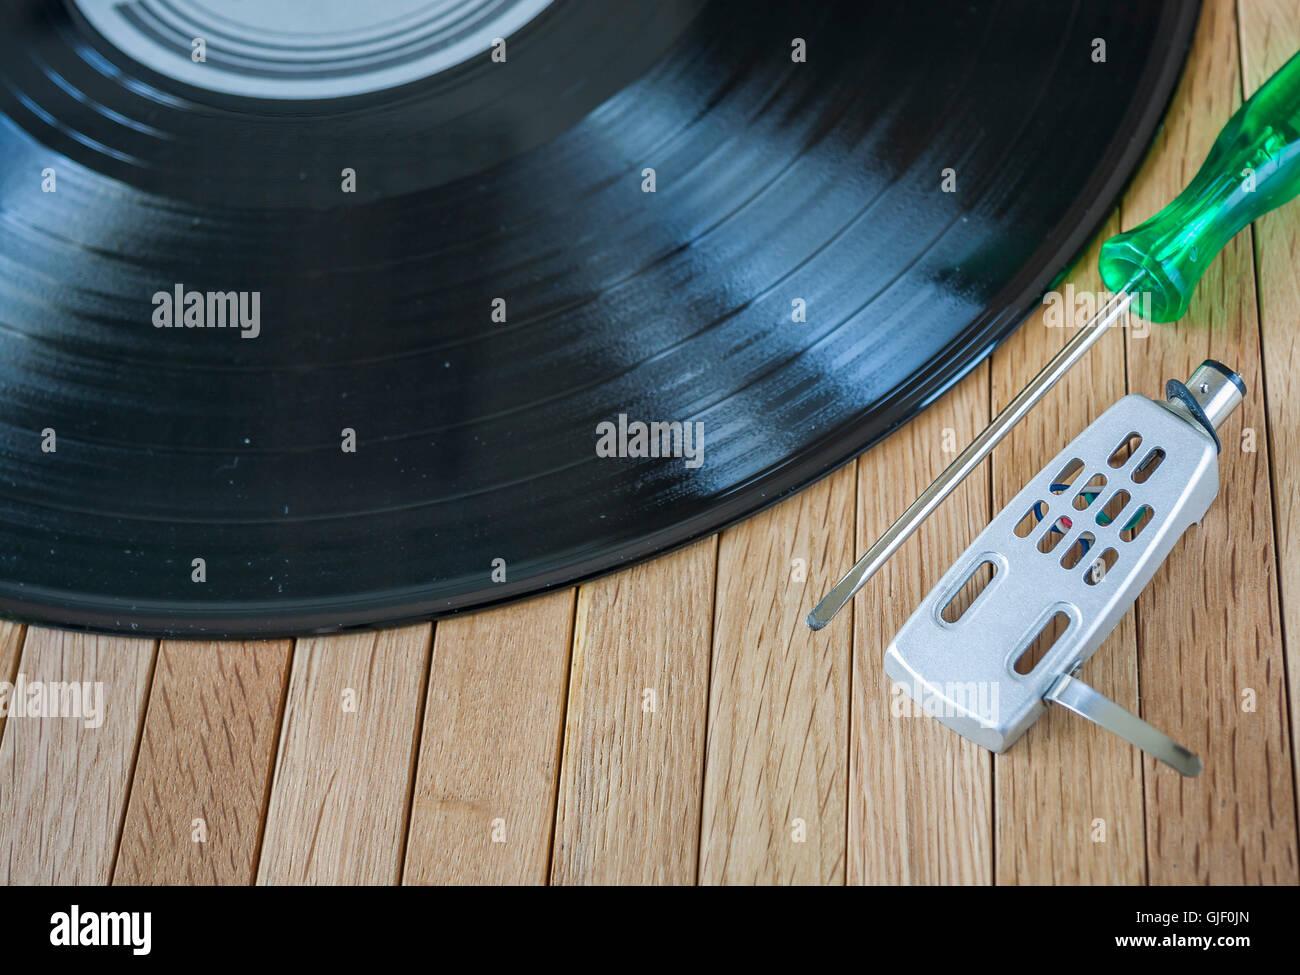 Turn Head Stockfotos & Turn Head Bilder - Alamy